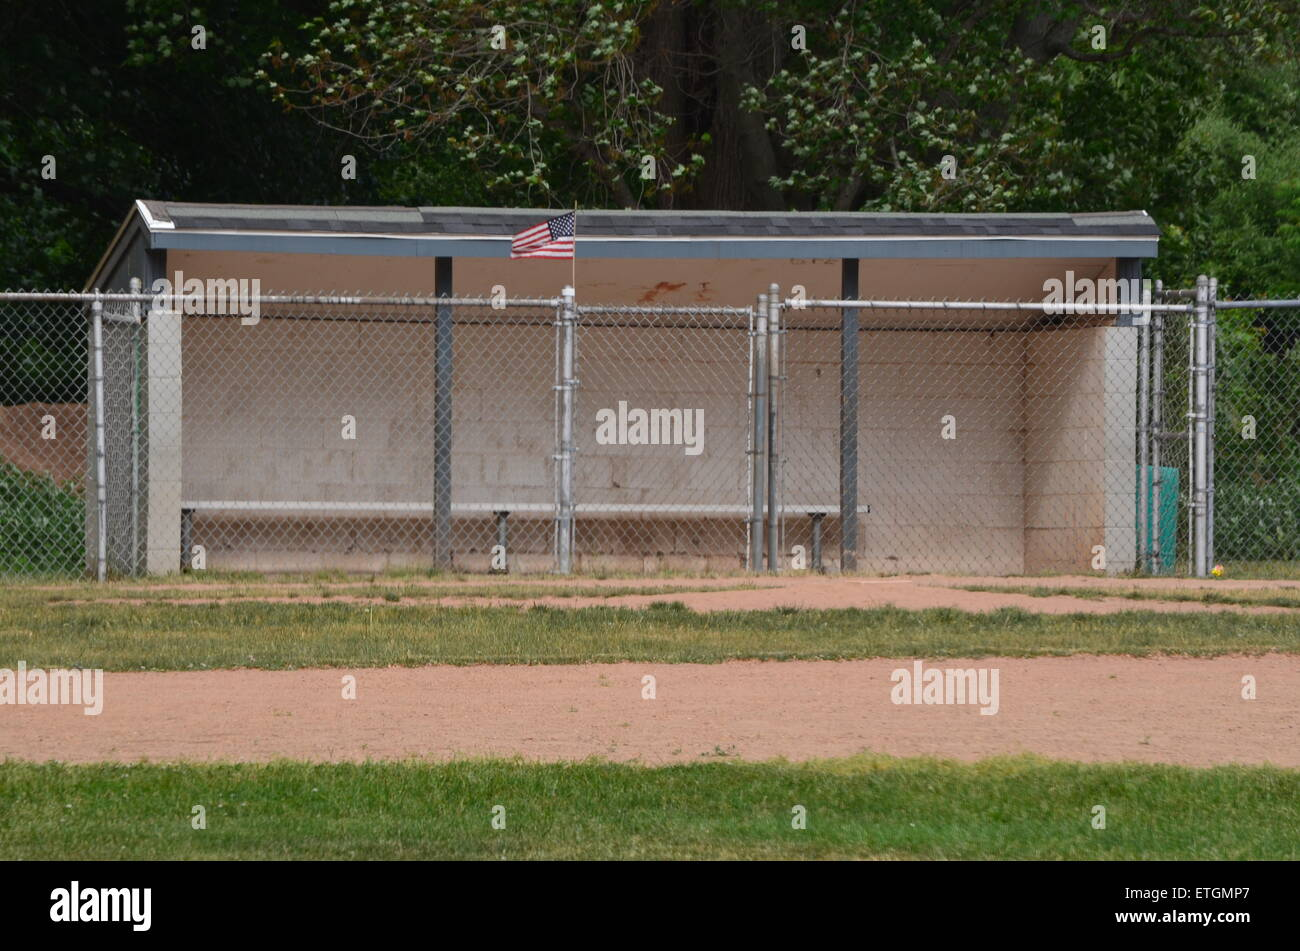 Baseball Dugout Stock Photo 83960751 Alamy